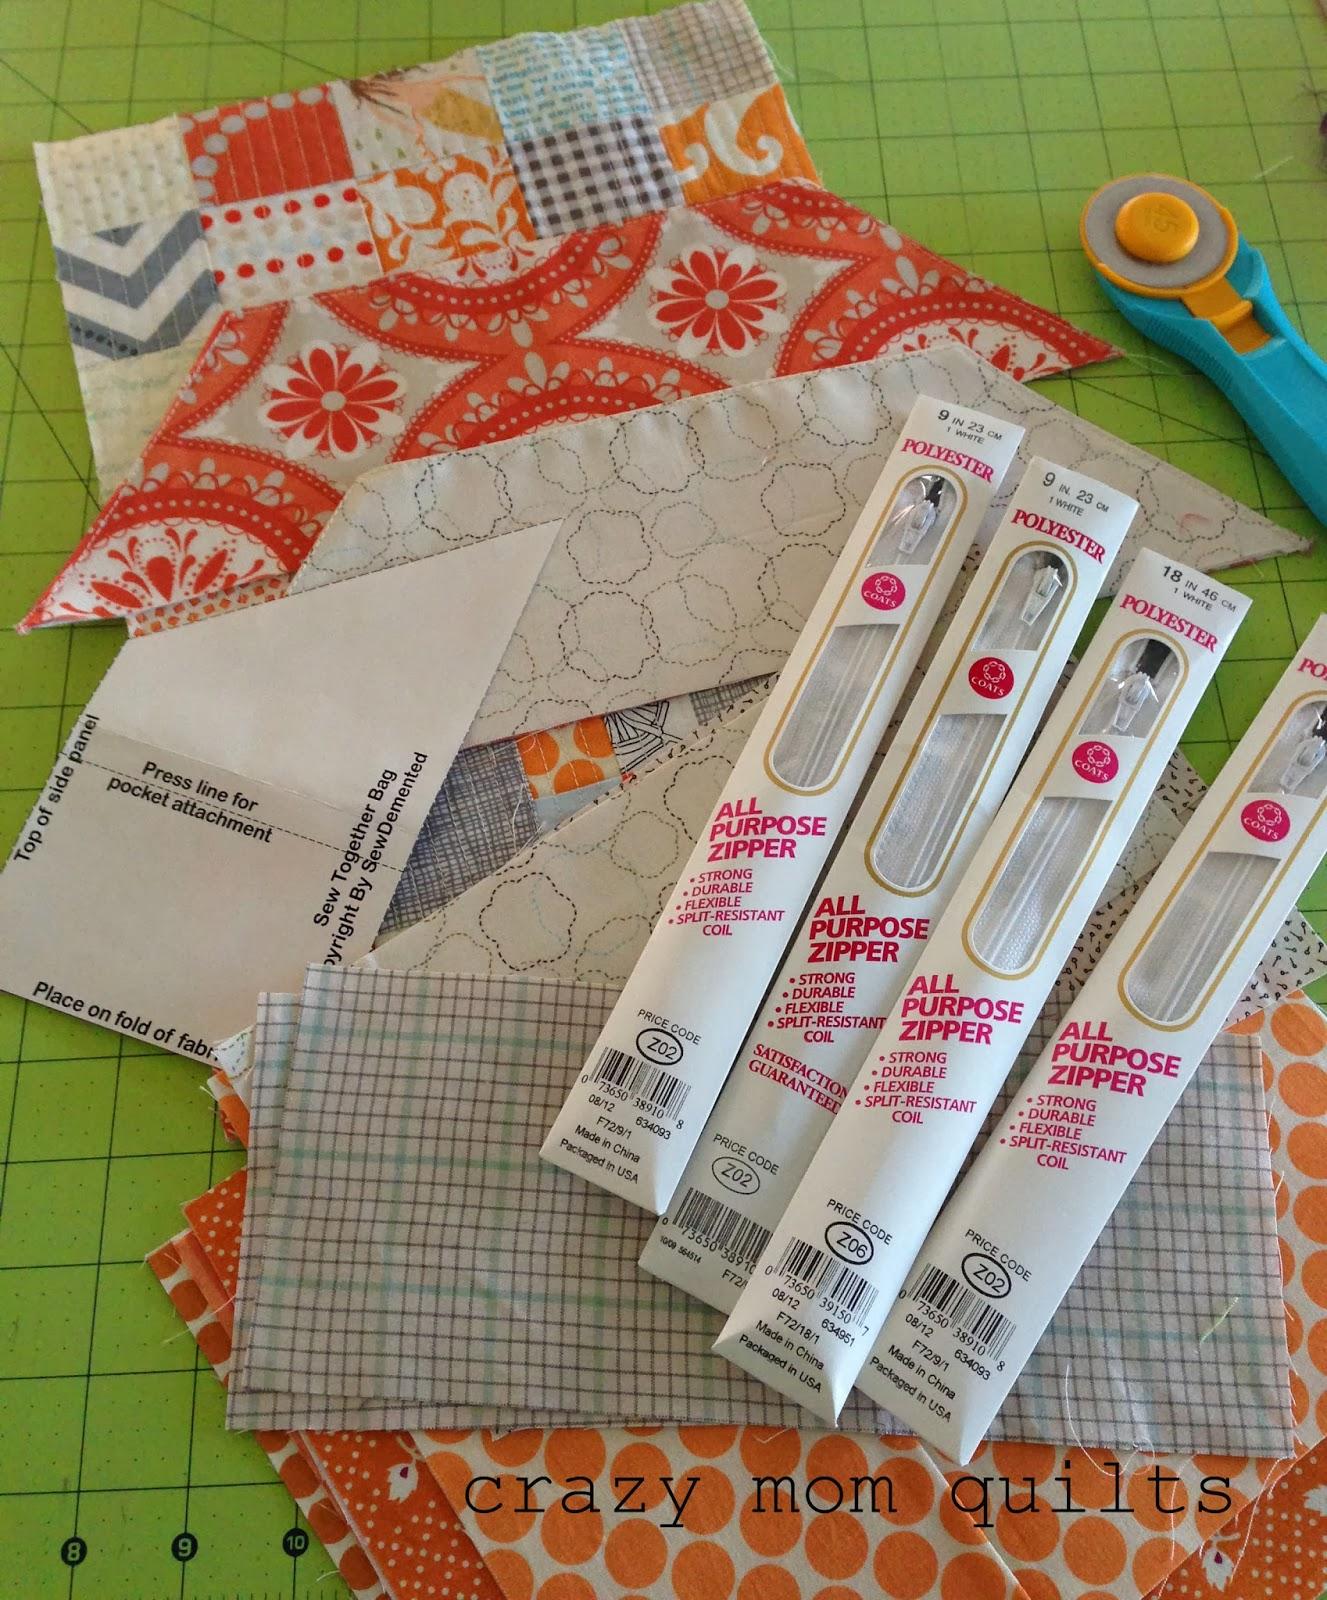 Crazy mom quilts sew together bag sew together bag jeuxipadfo Choice Image